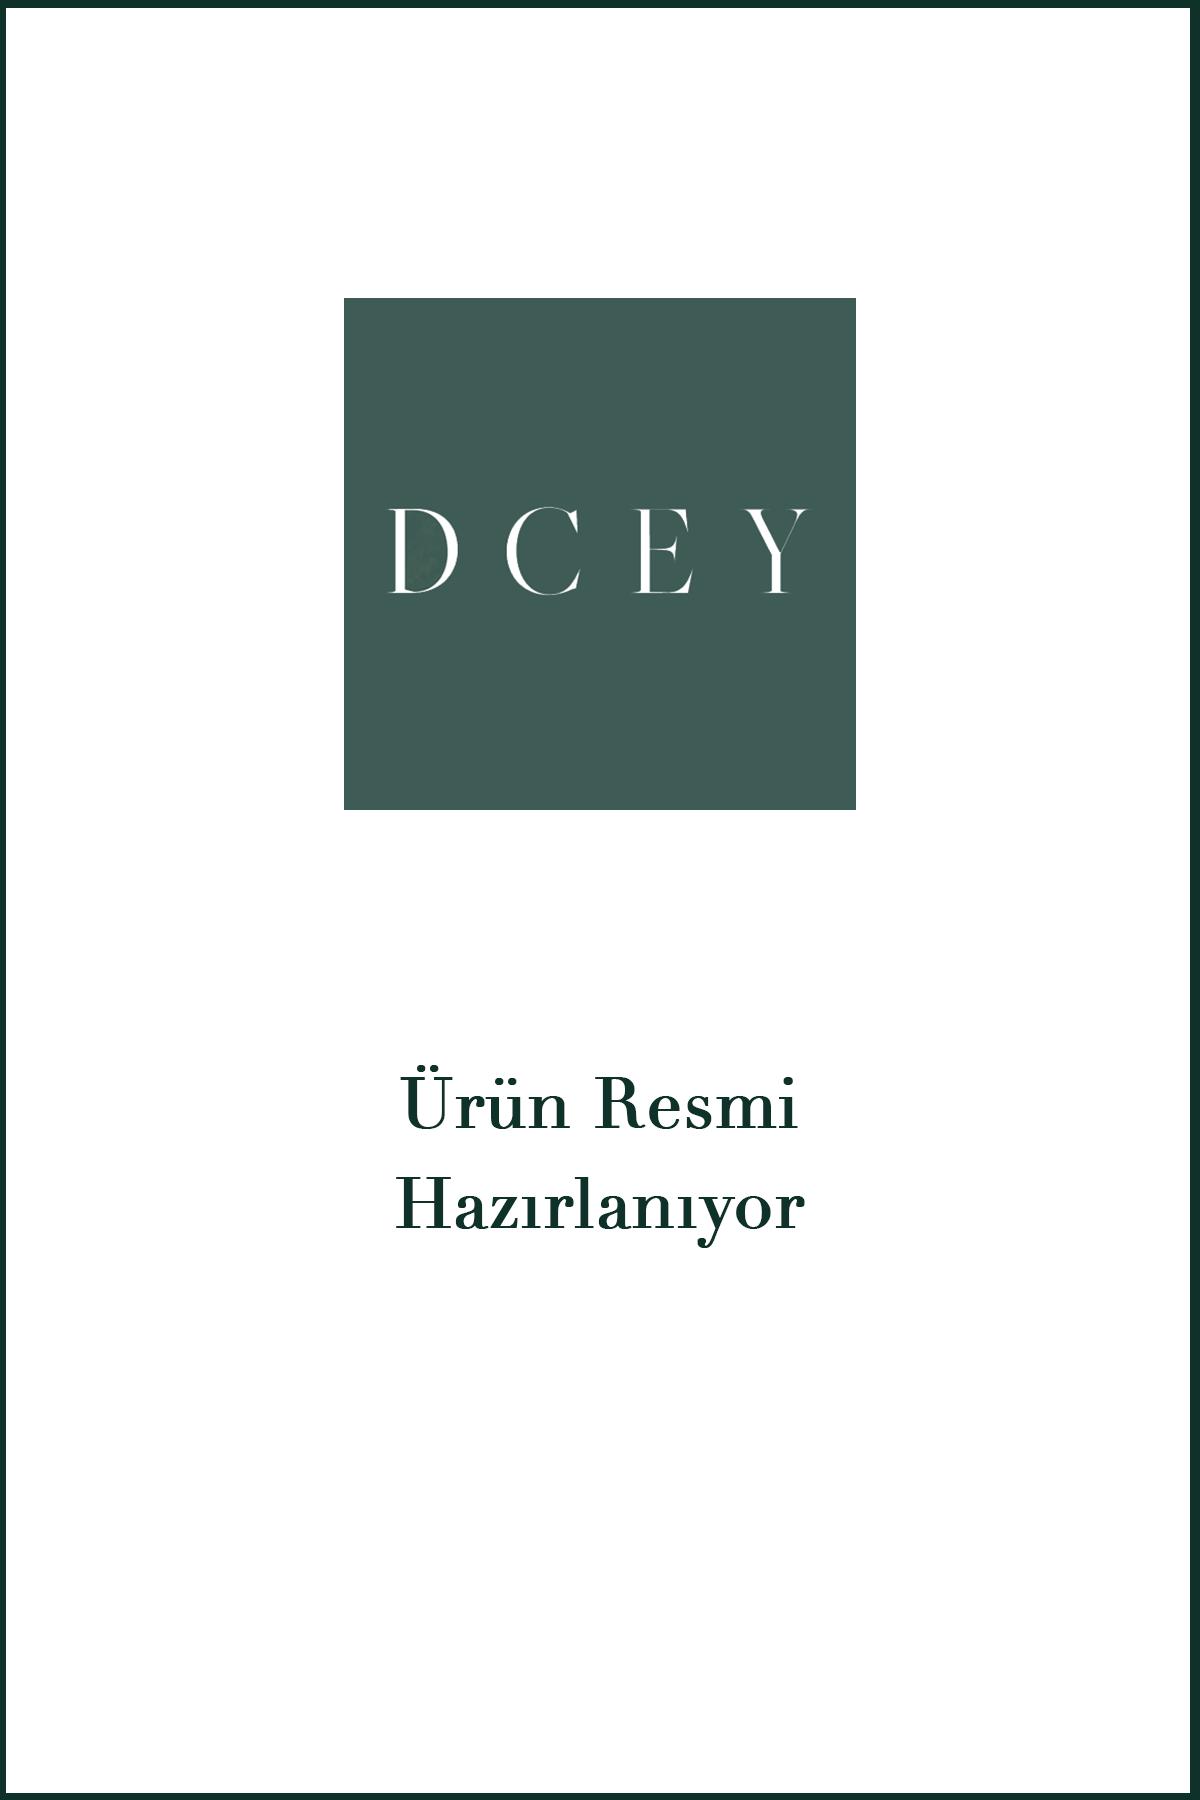 Gisele Mini Elbise